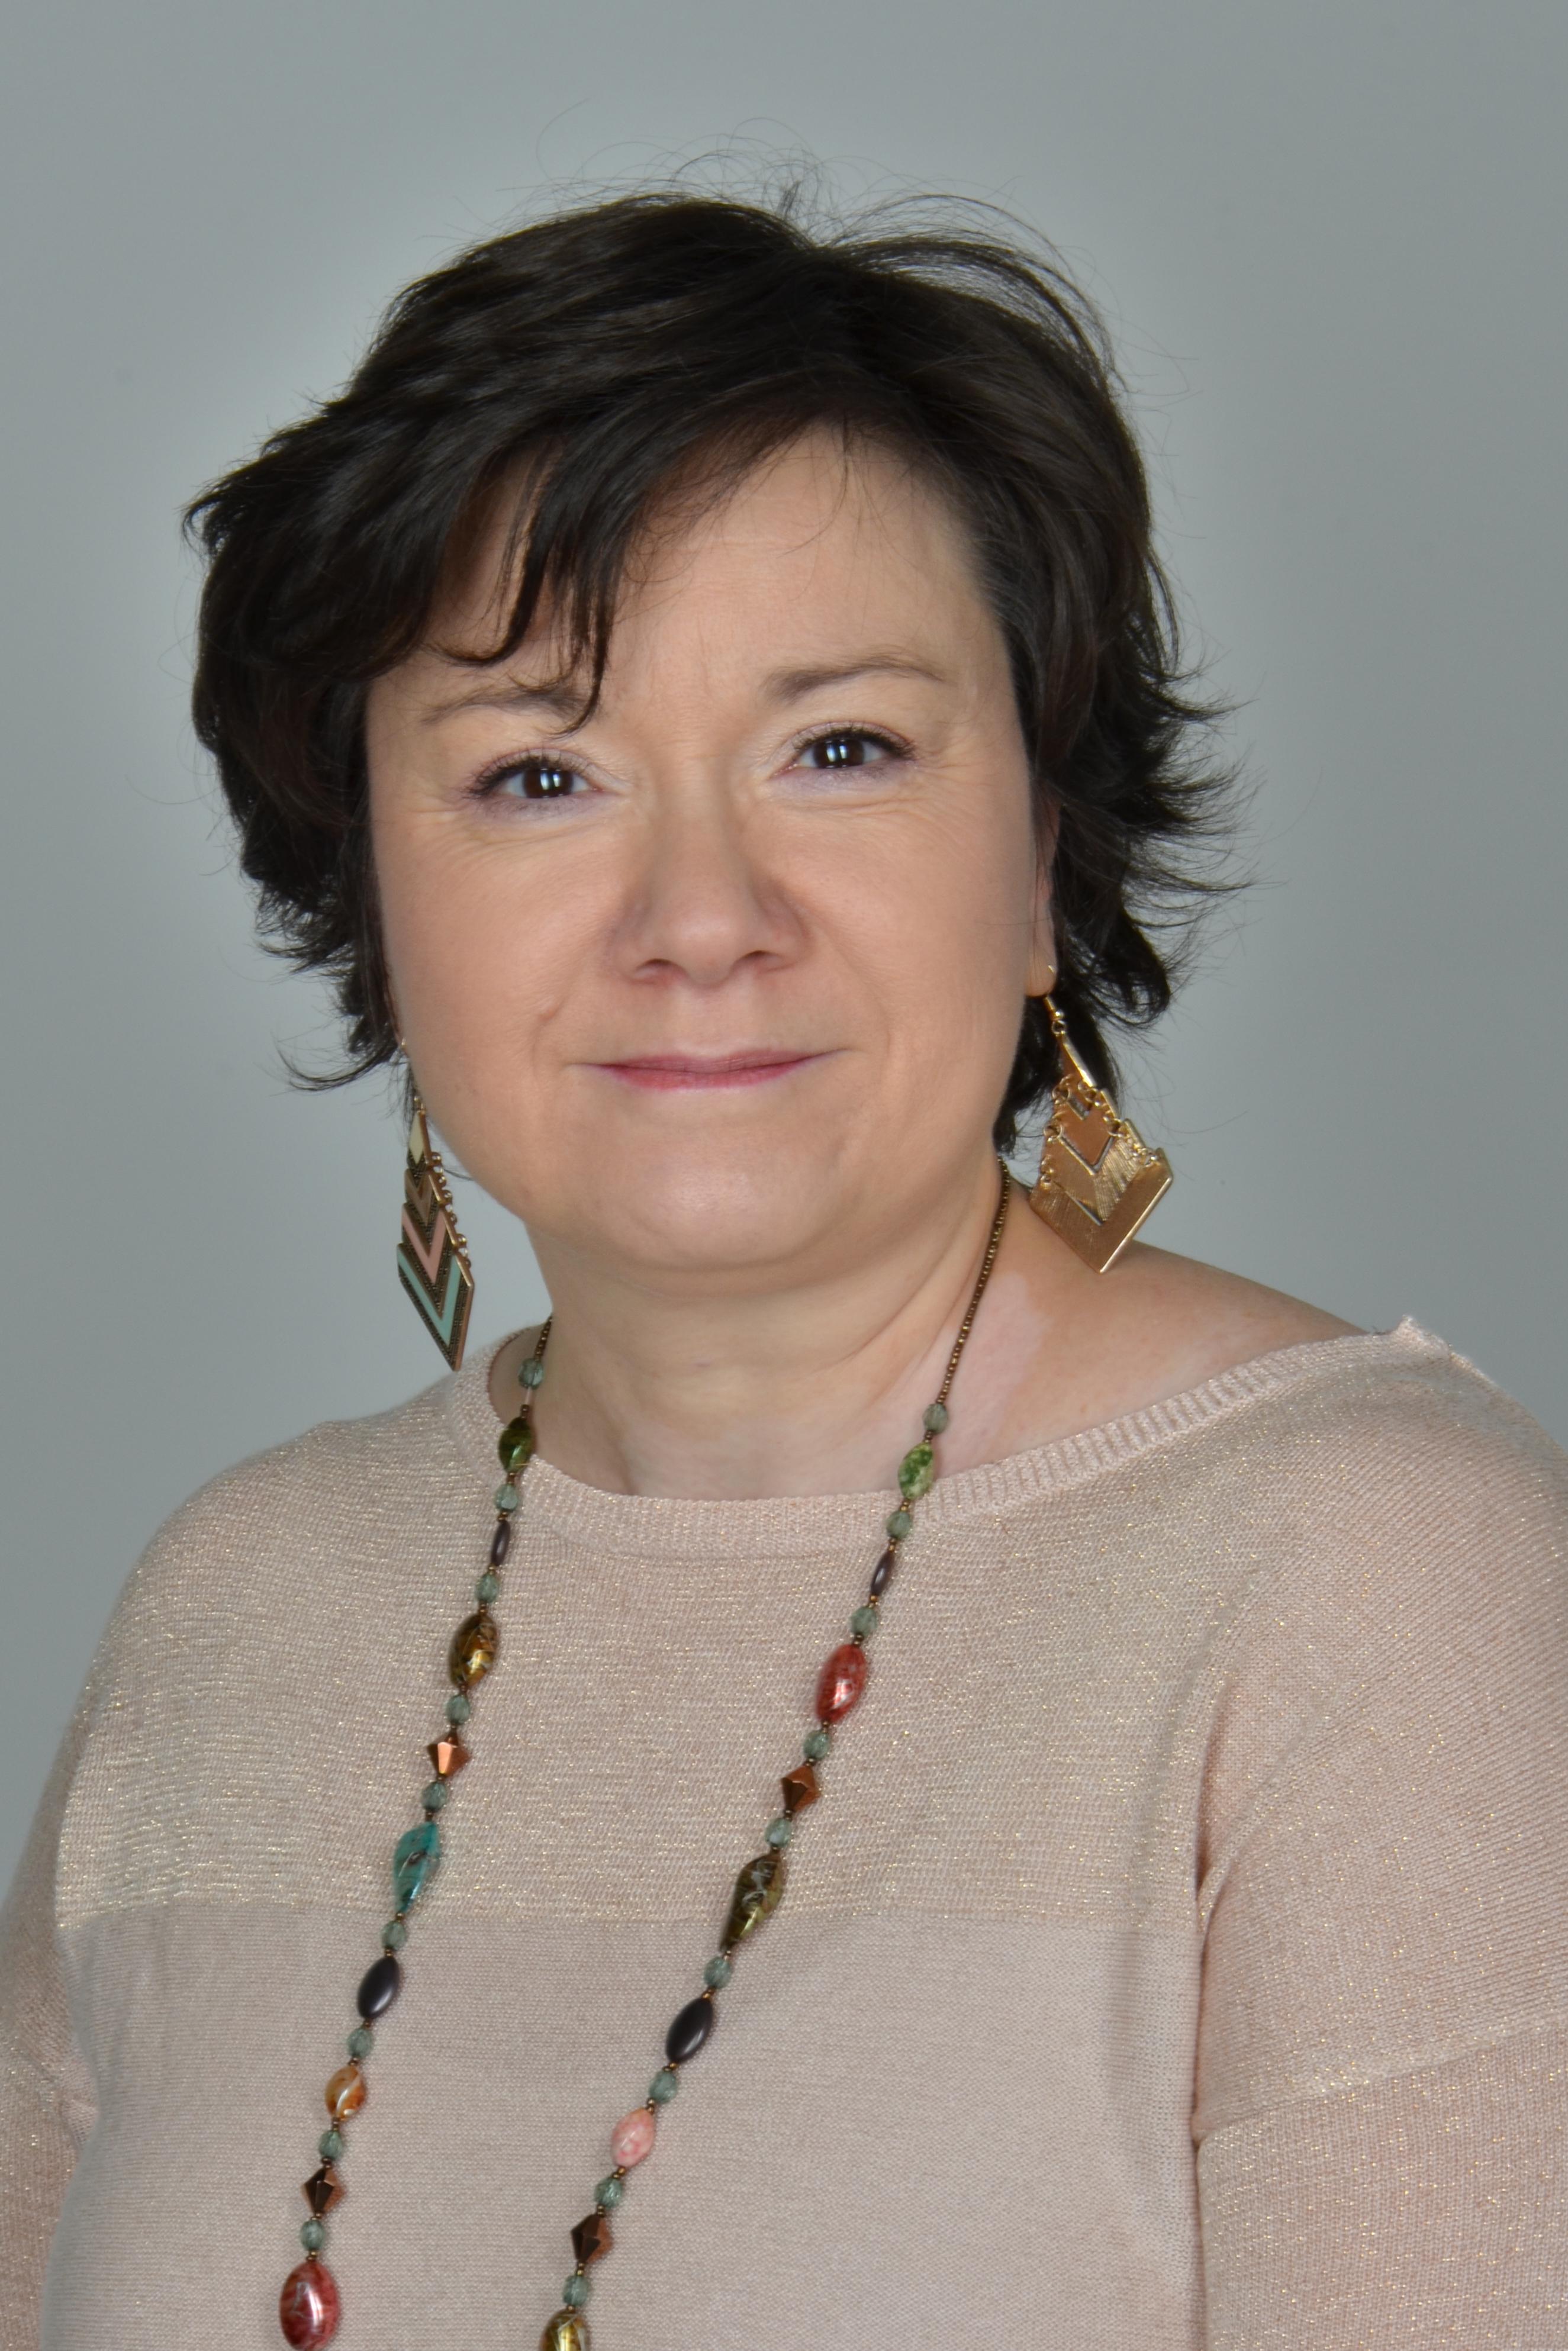 Sarah Alimondo, Présidente du SNK